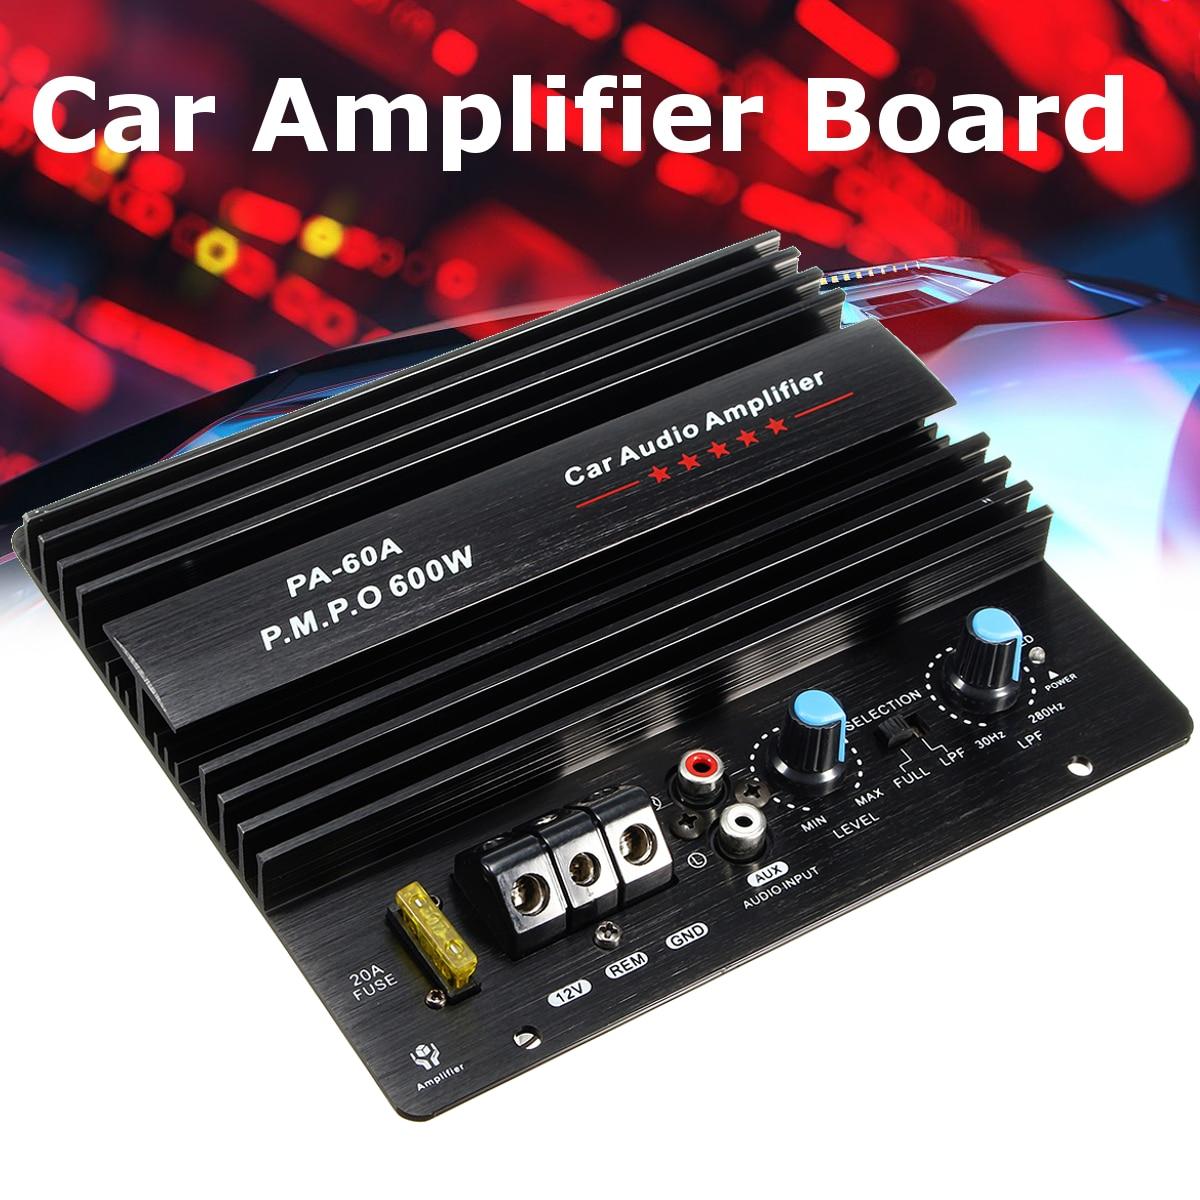 New Audew 600W Car Mono Amplifier Board Home Vehicle Subwoofer Speaker Super Bass Auto Audio Subwoofers Amp Car Audio Stereo auto audio